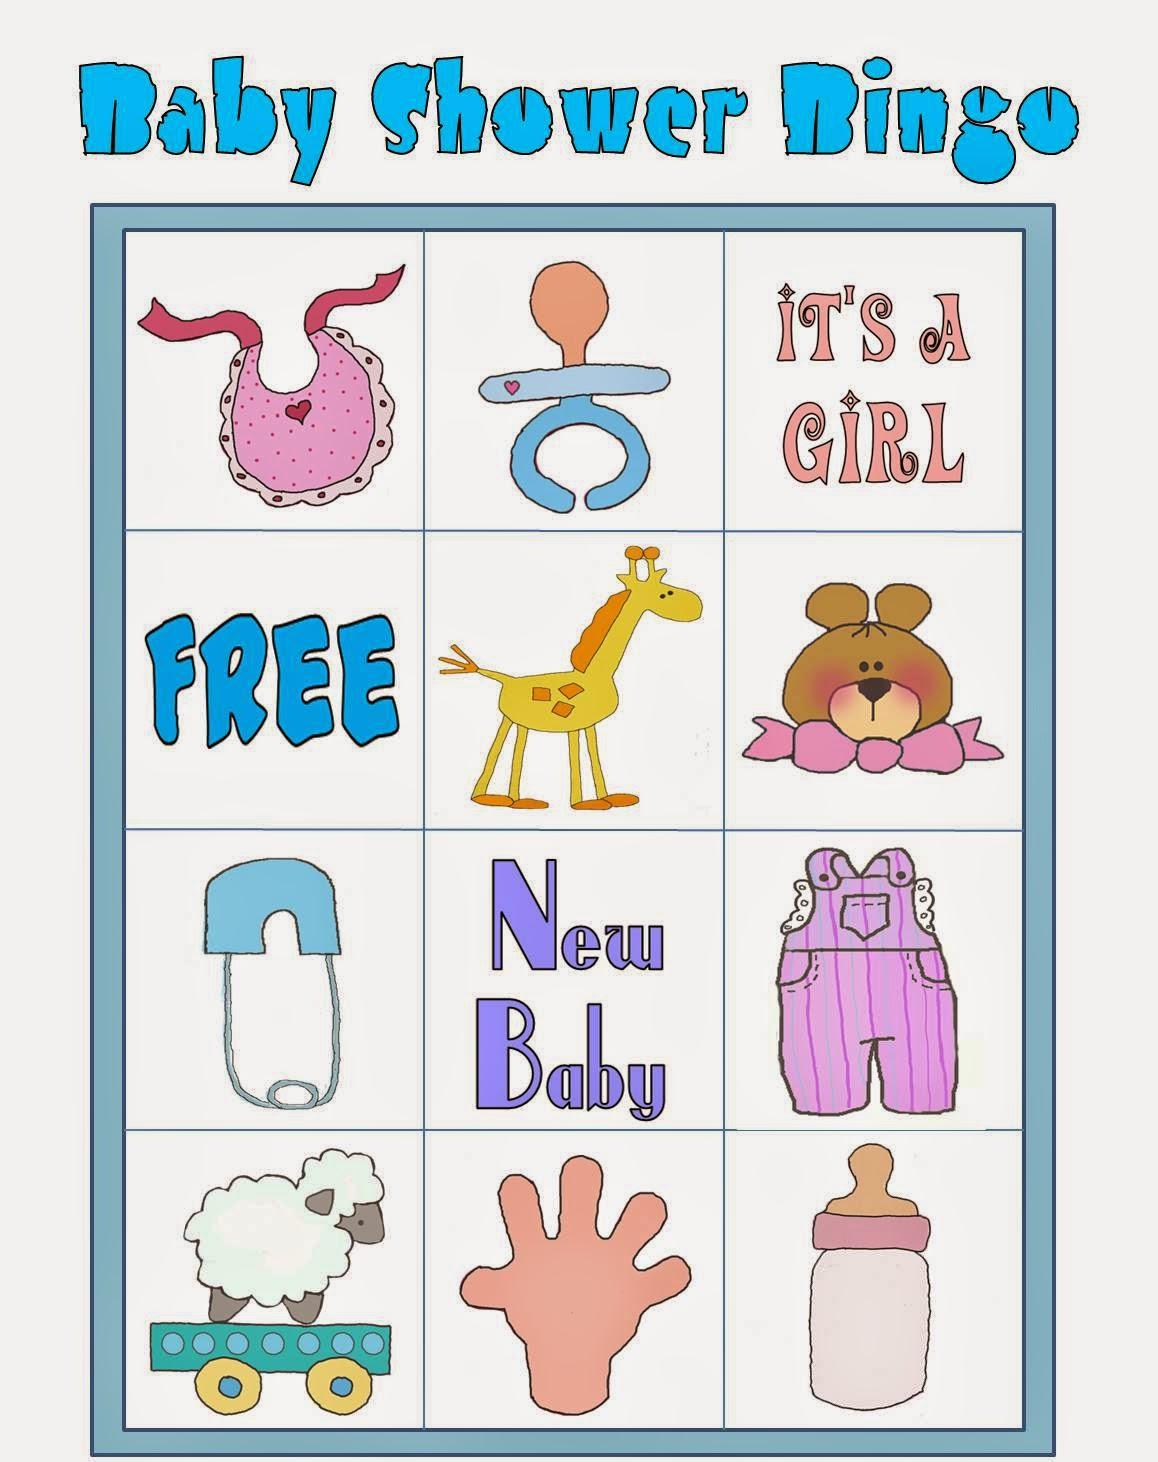 Muitas vezes Free Printable Baby Shower Bingo in Colors. | Oh My Baby! MQ56